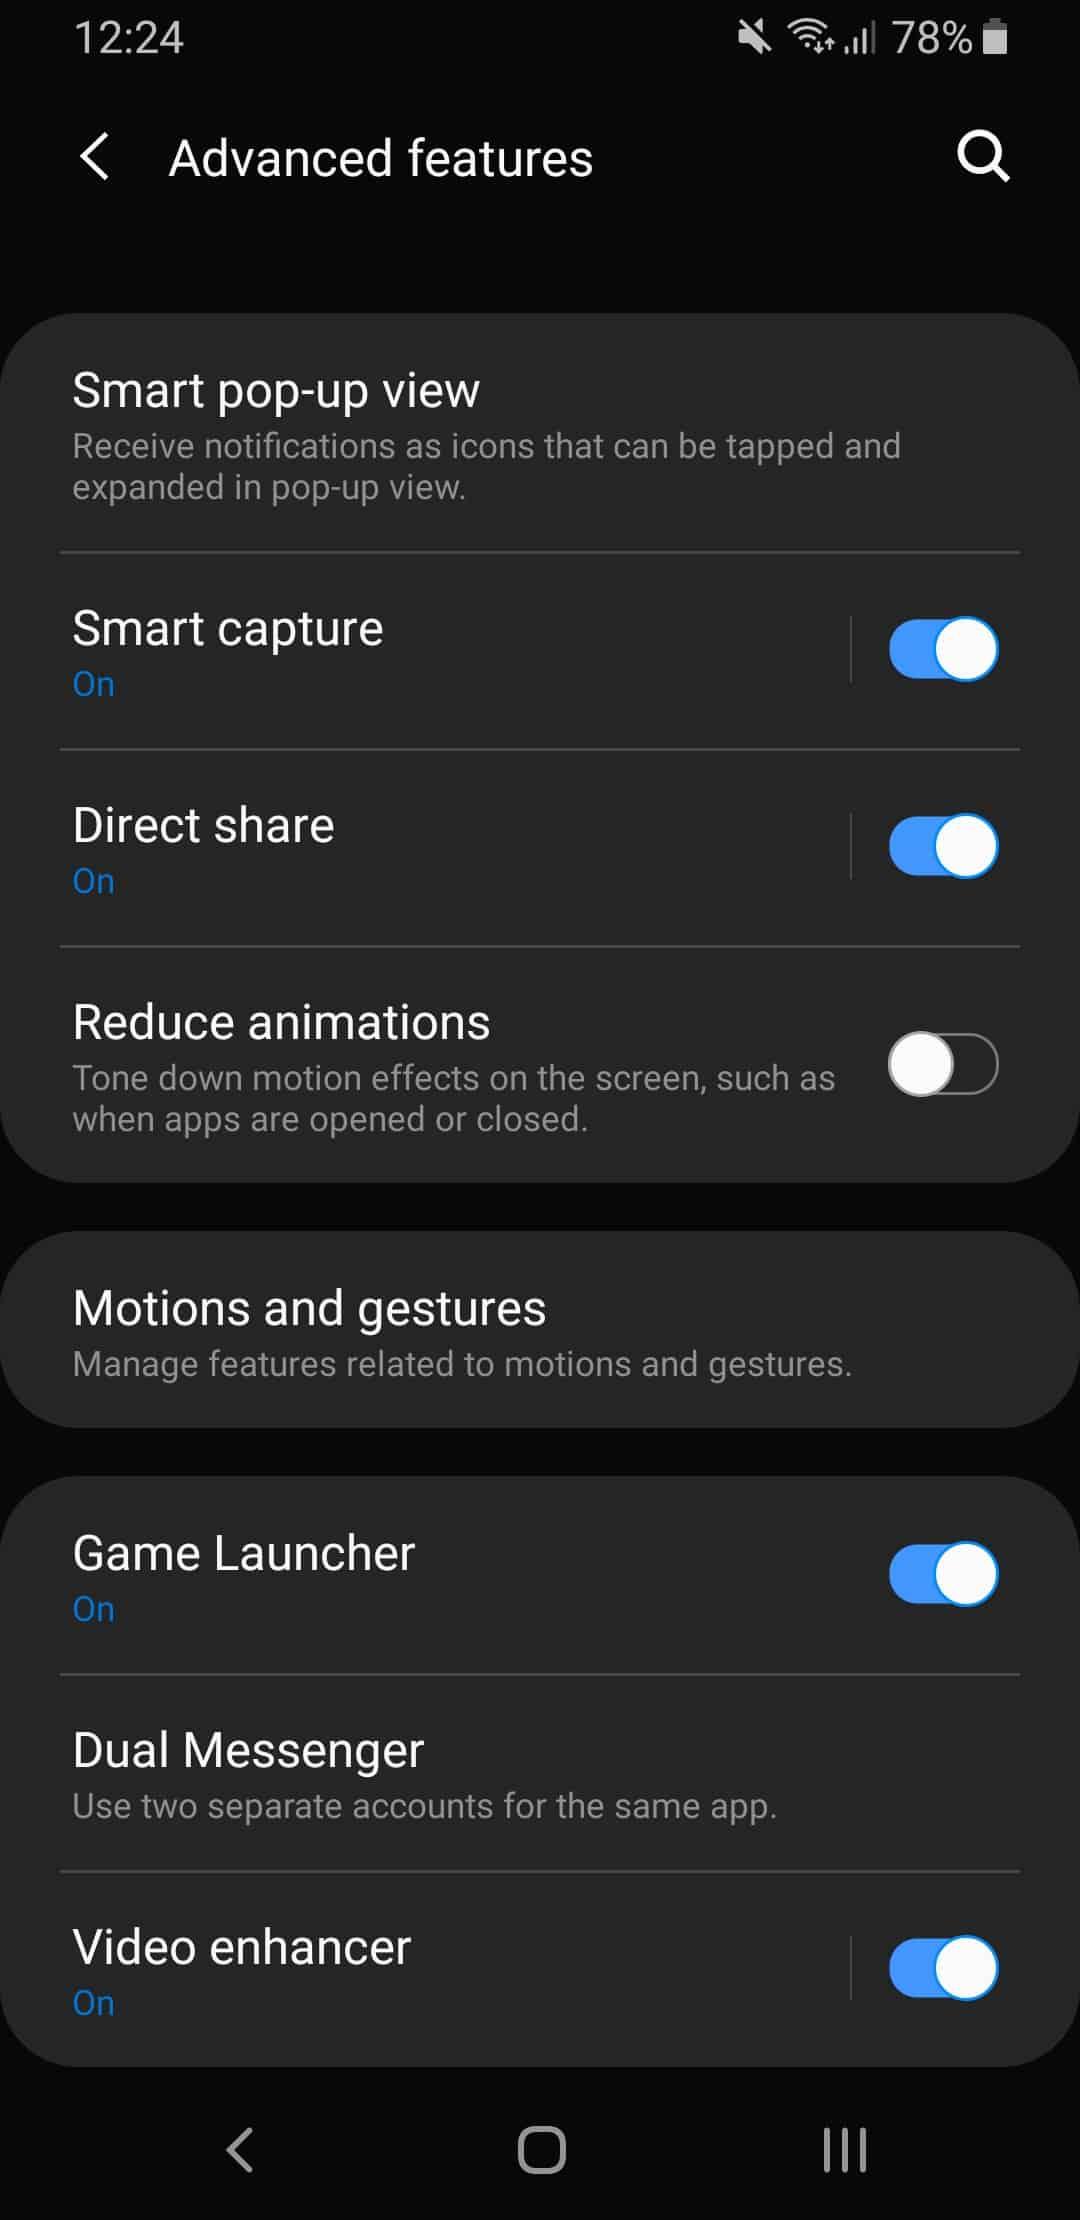 Samsung One UI advanced settings.